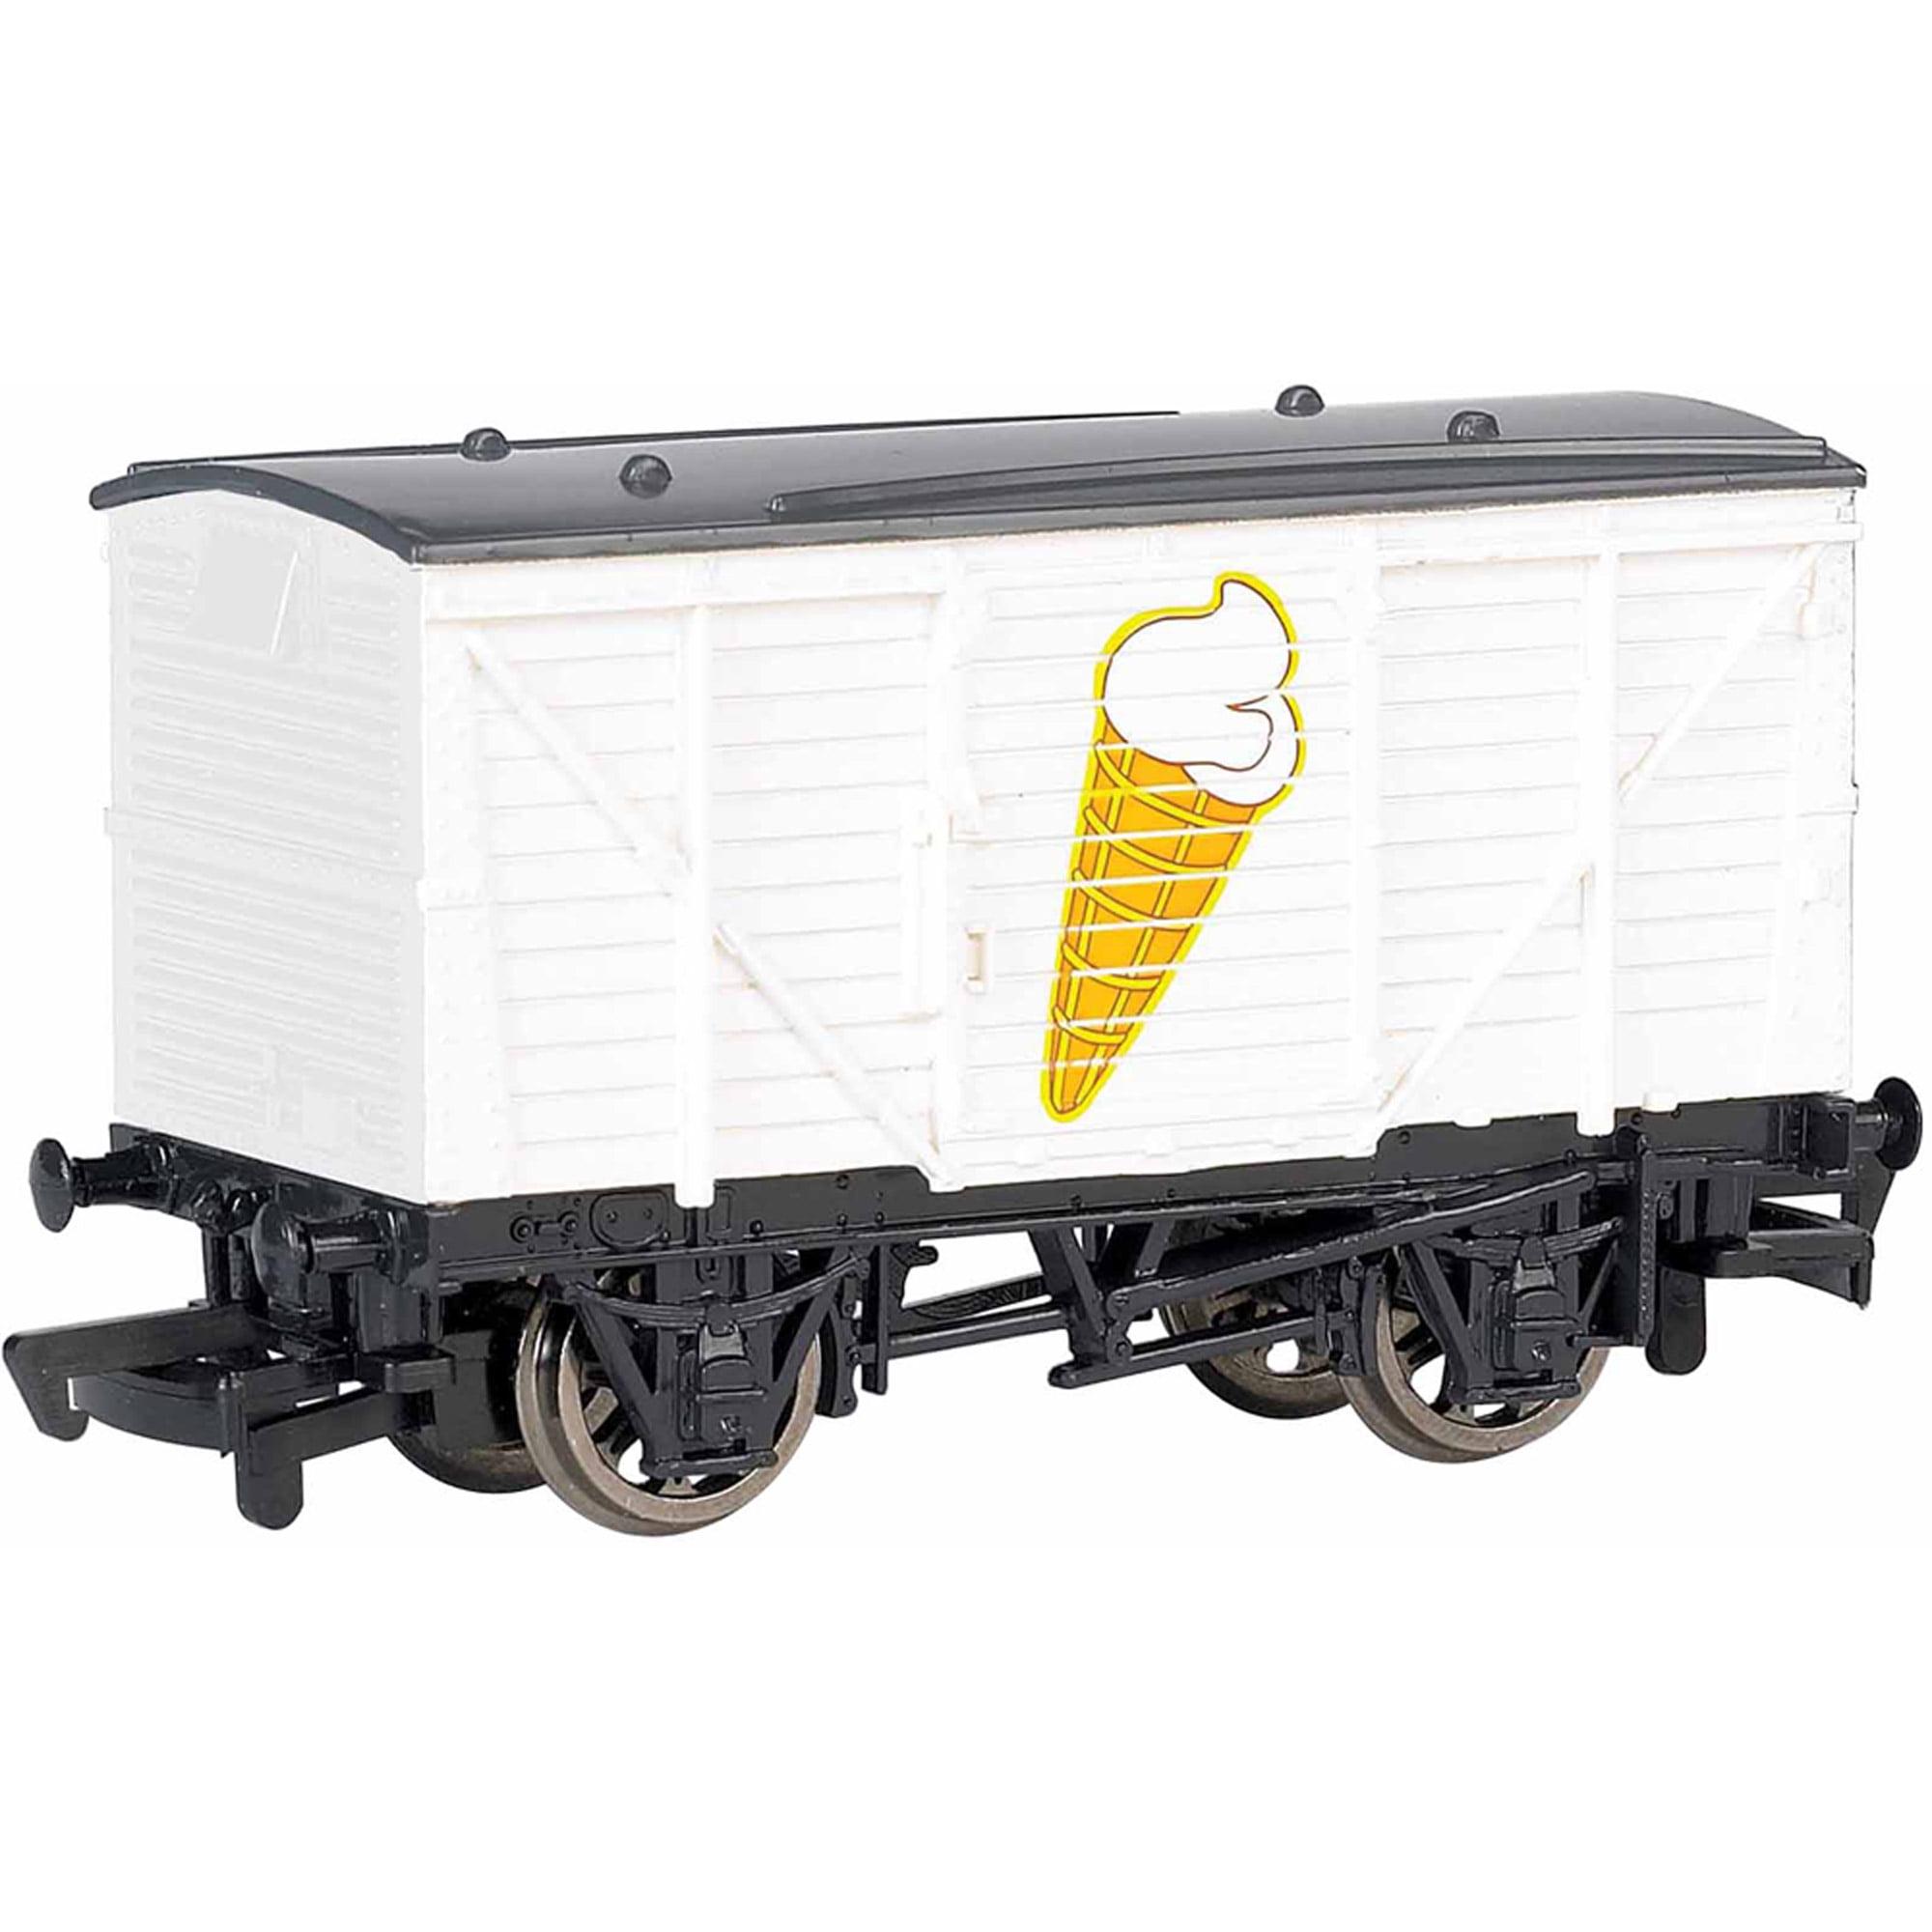 Bachmann Trains Thomas and Friends Ice Cream Wagon, HO Scale Train by Bachmann Trains